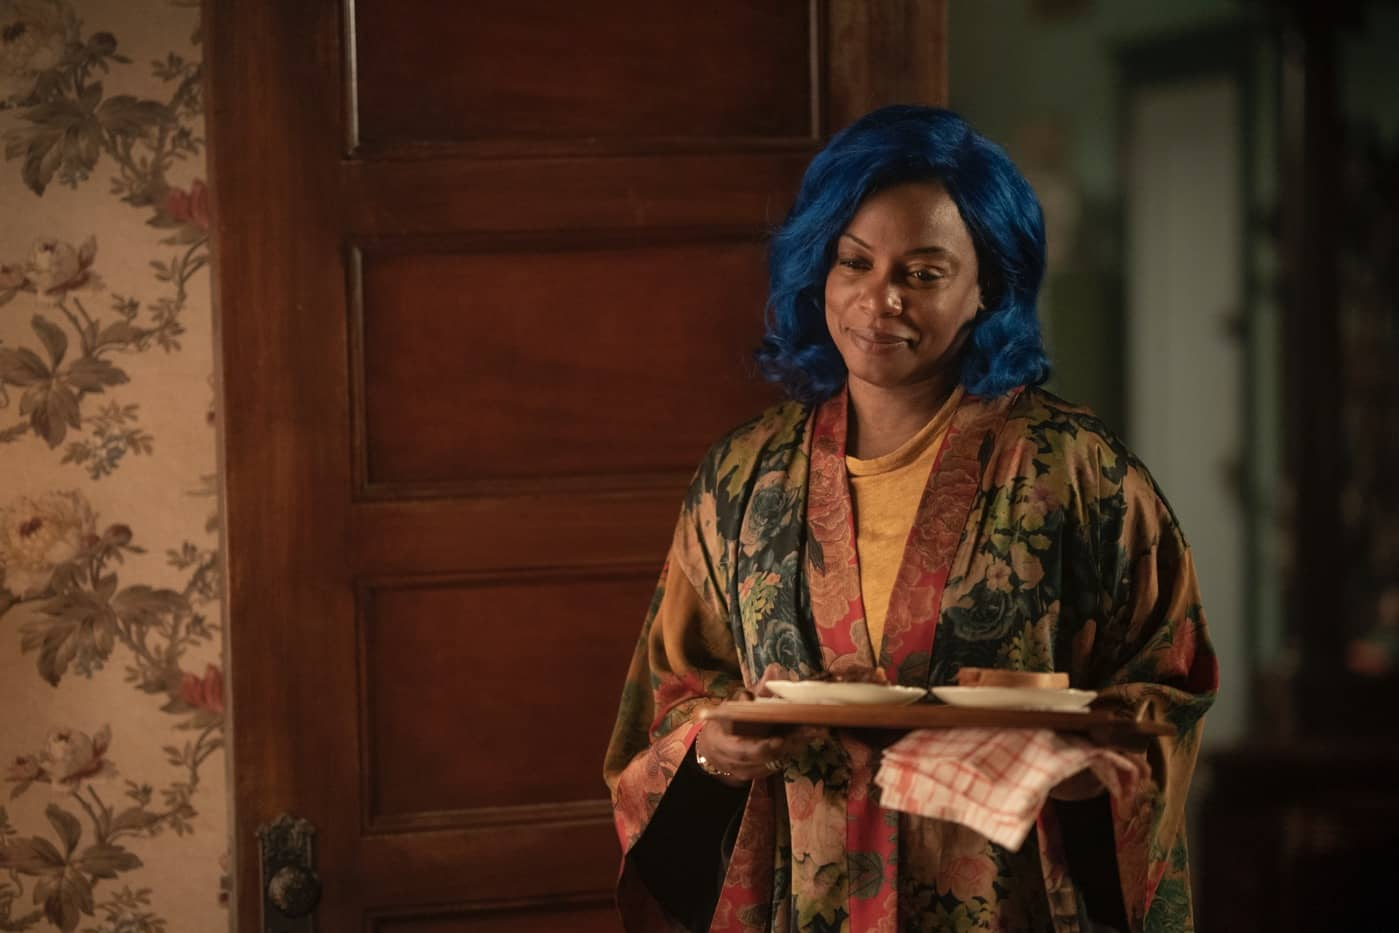 Aunjanue Ellis LOVECRAFT COUNTRY Season 1 - Episode 10 Photograph by Eli Joshua Ade/HBO